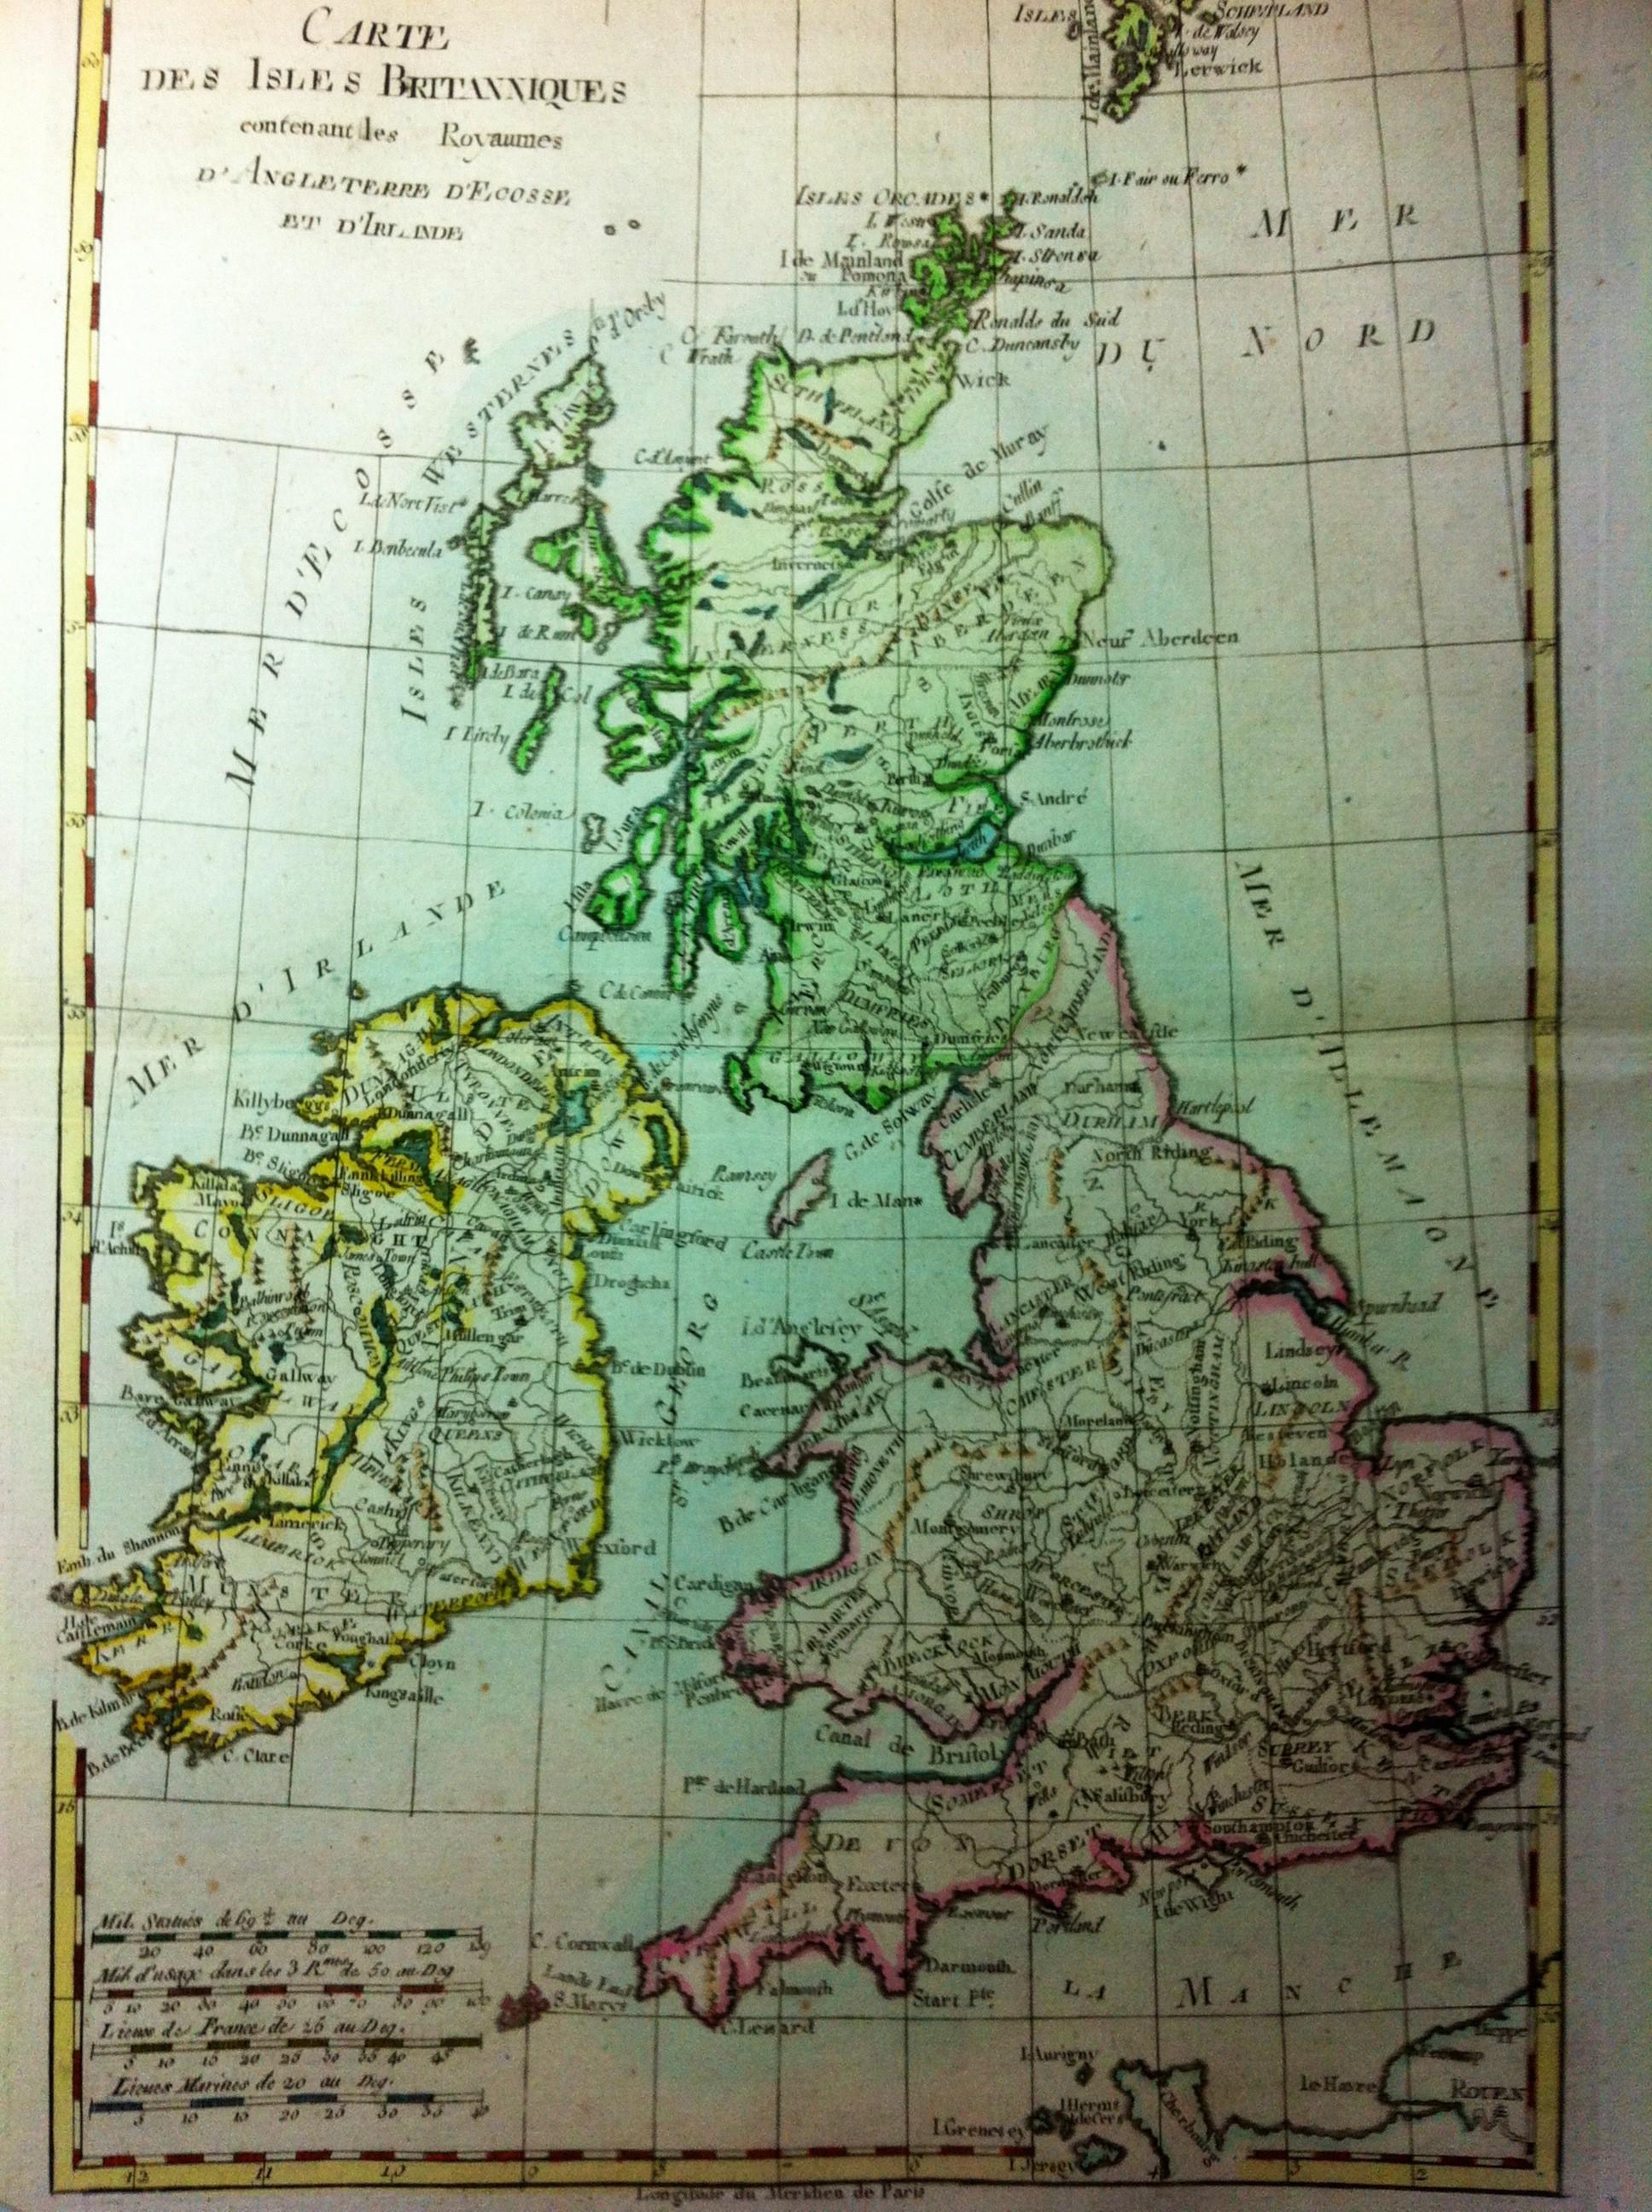 Carte Angleterre Ecosse.Carte Des Isles Britanniques Contenant Les Royaumes D Angleterre D